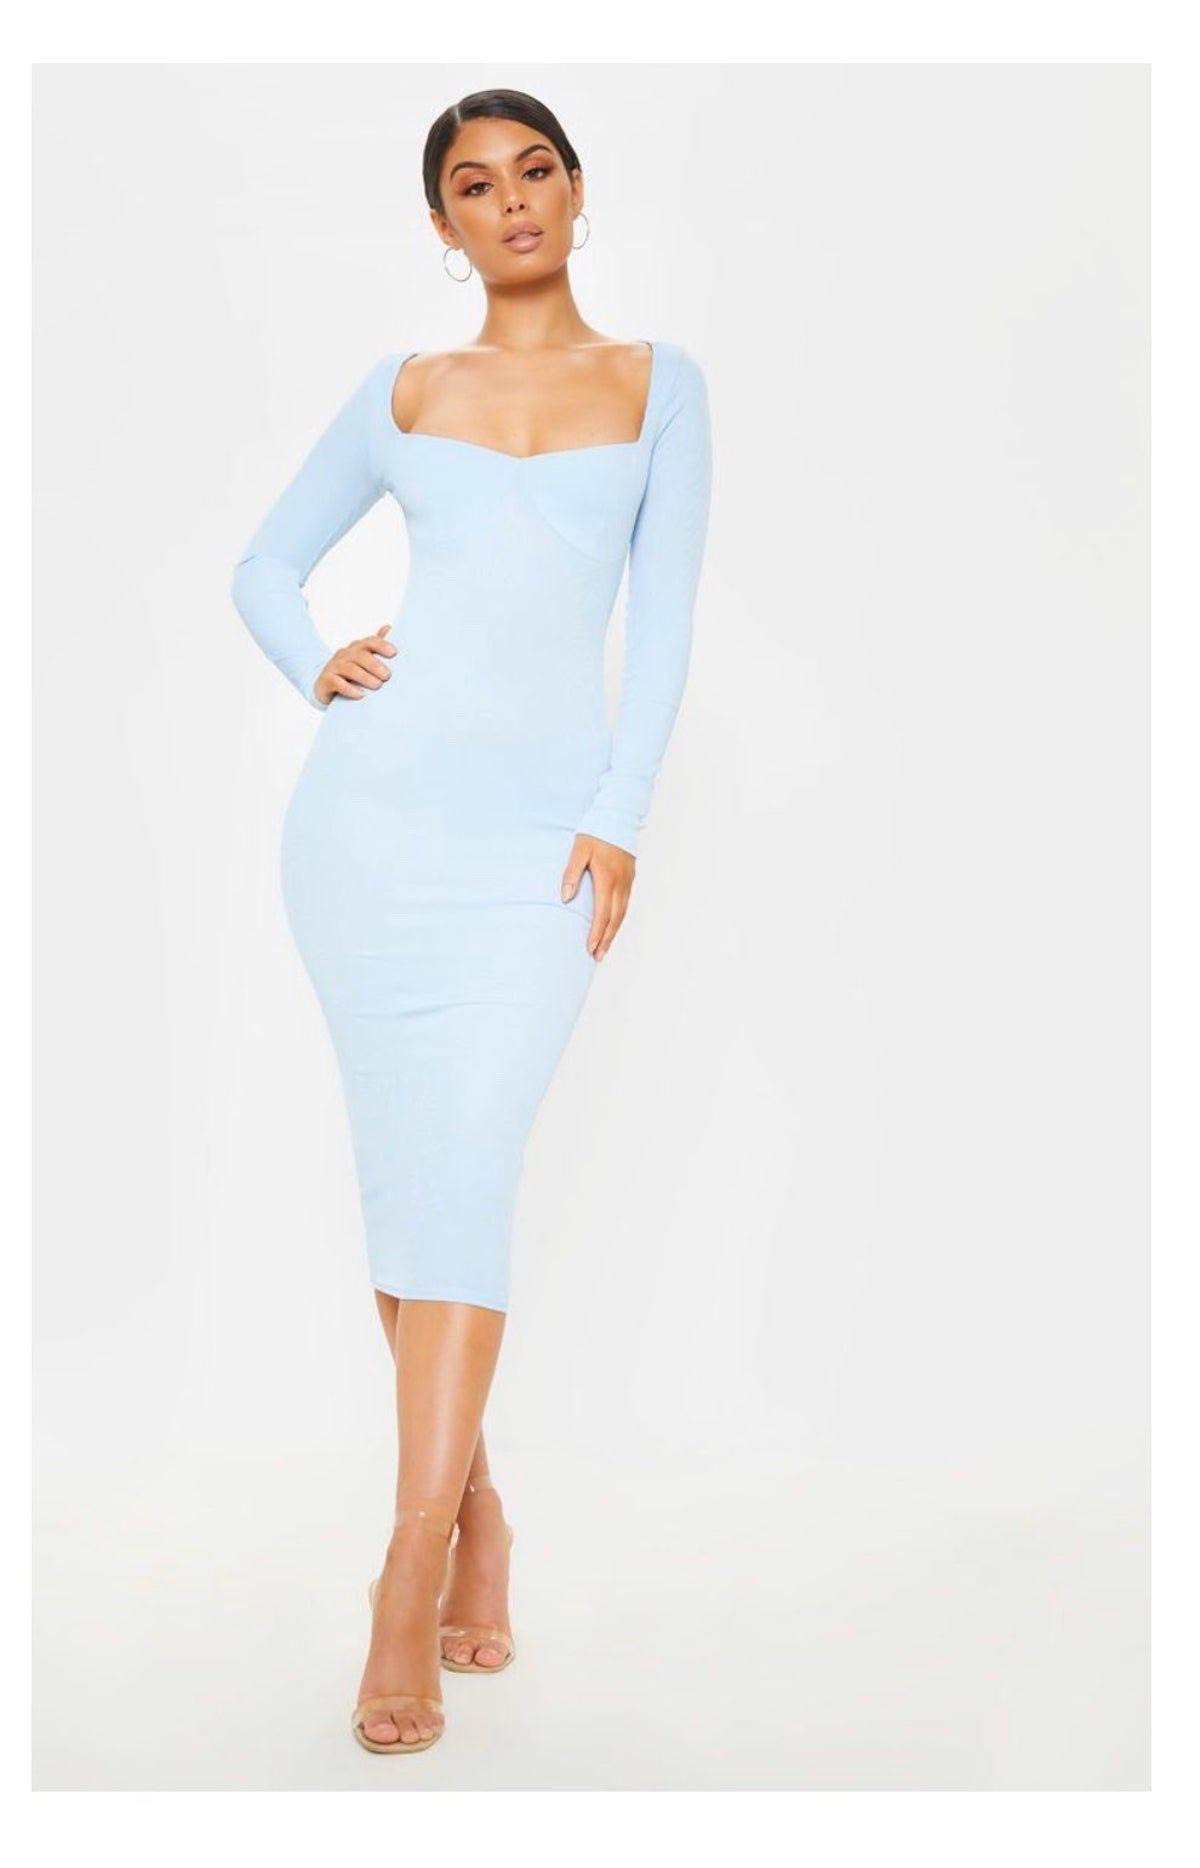 Prettylittlething Baby Blue Long Sleeve Long Sleeve Dress Outfit Long Sleeve Midi Dress Blue Bodycon Dress [ jpg ]